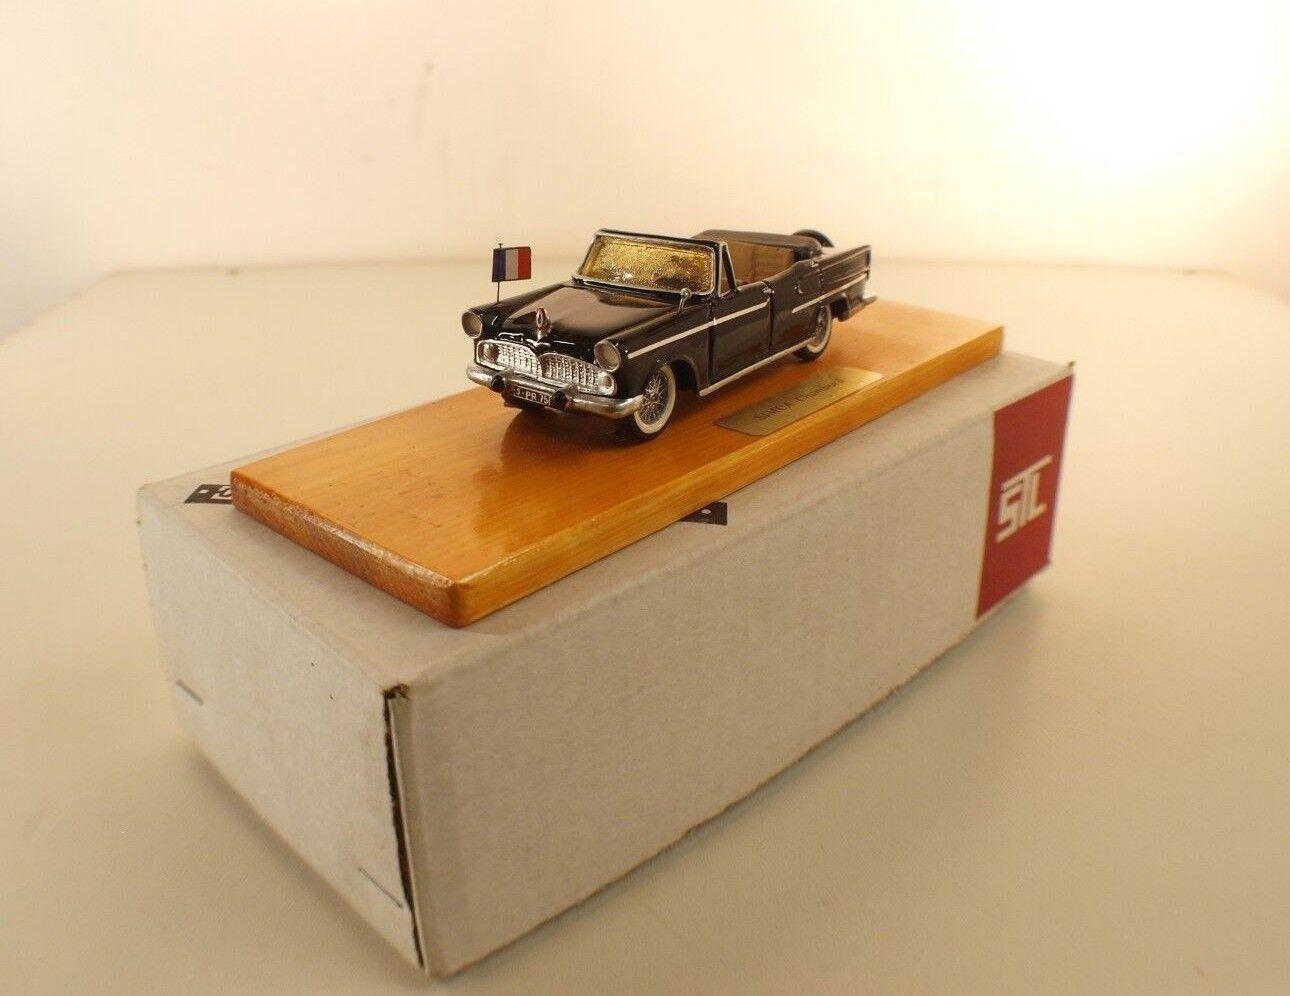 Stl. Frankreich Simca Chambord Cabriolet Présidentielle Harz 1 43 Serie Prestige